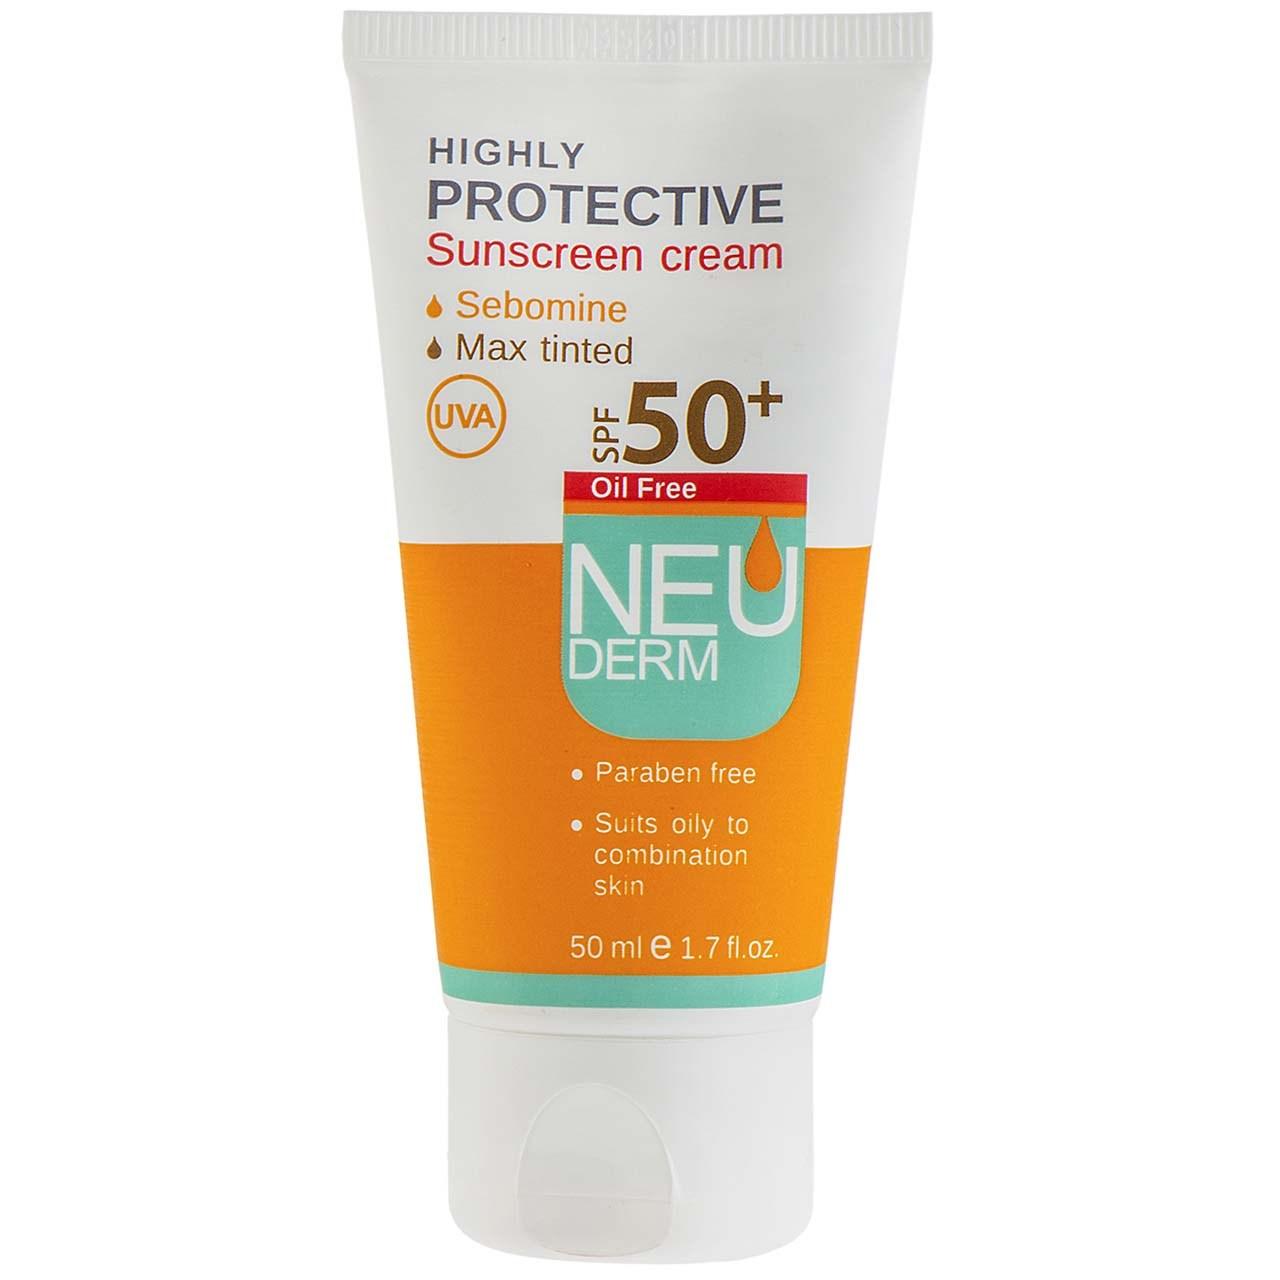 قیمت کرم ضد آفتاب نئودرم مدل Highly Protective Max Tinted SPF50 حجم 50 میلی لیتر